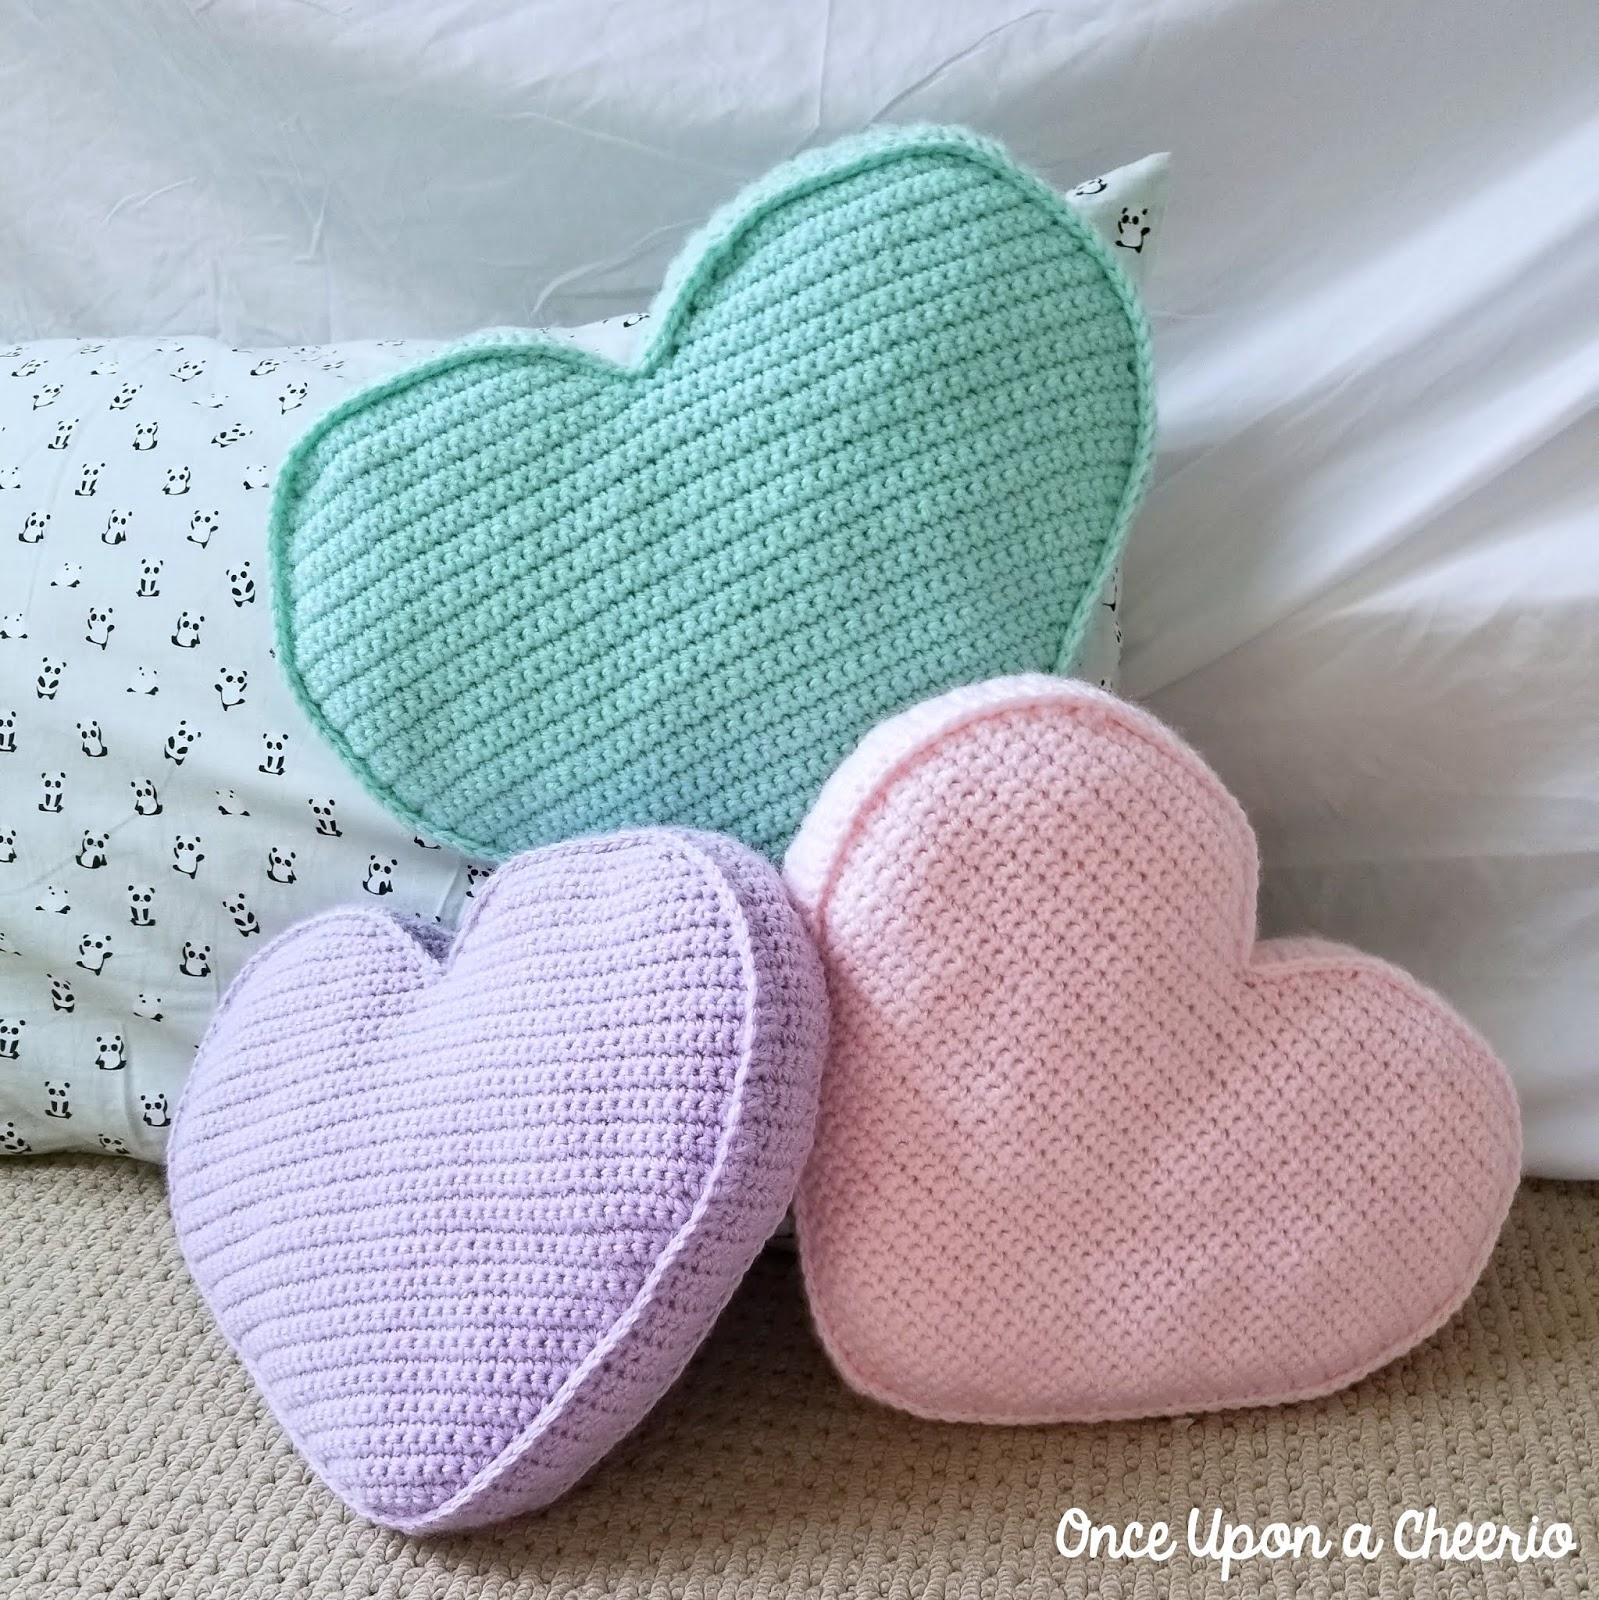 Crochet Patterns Galore